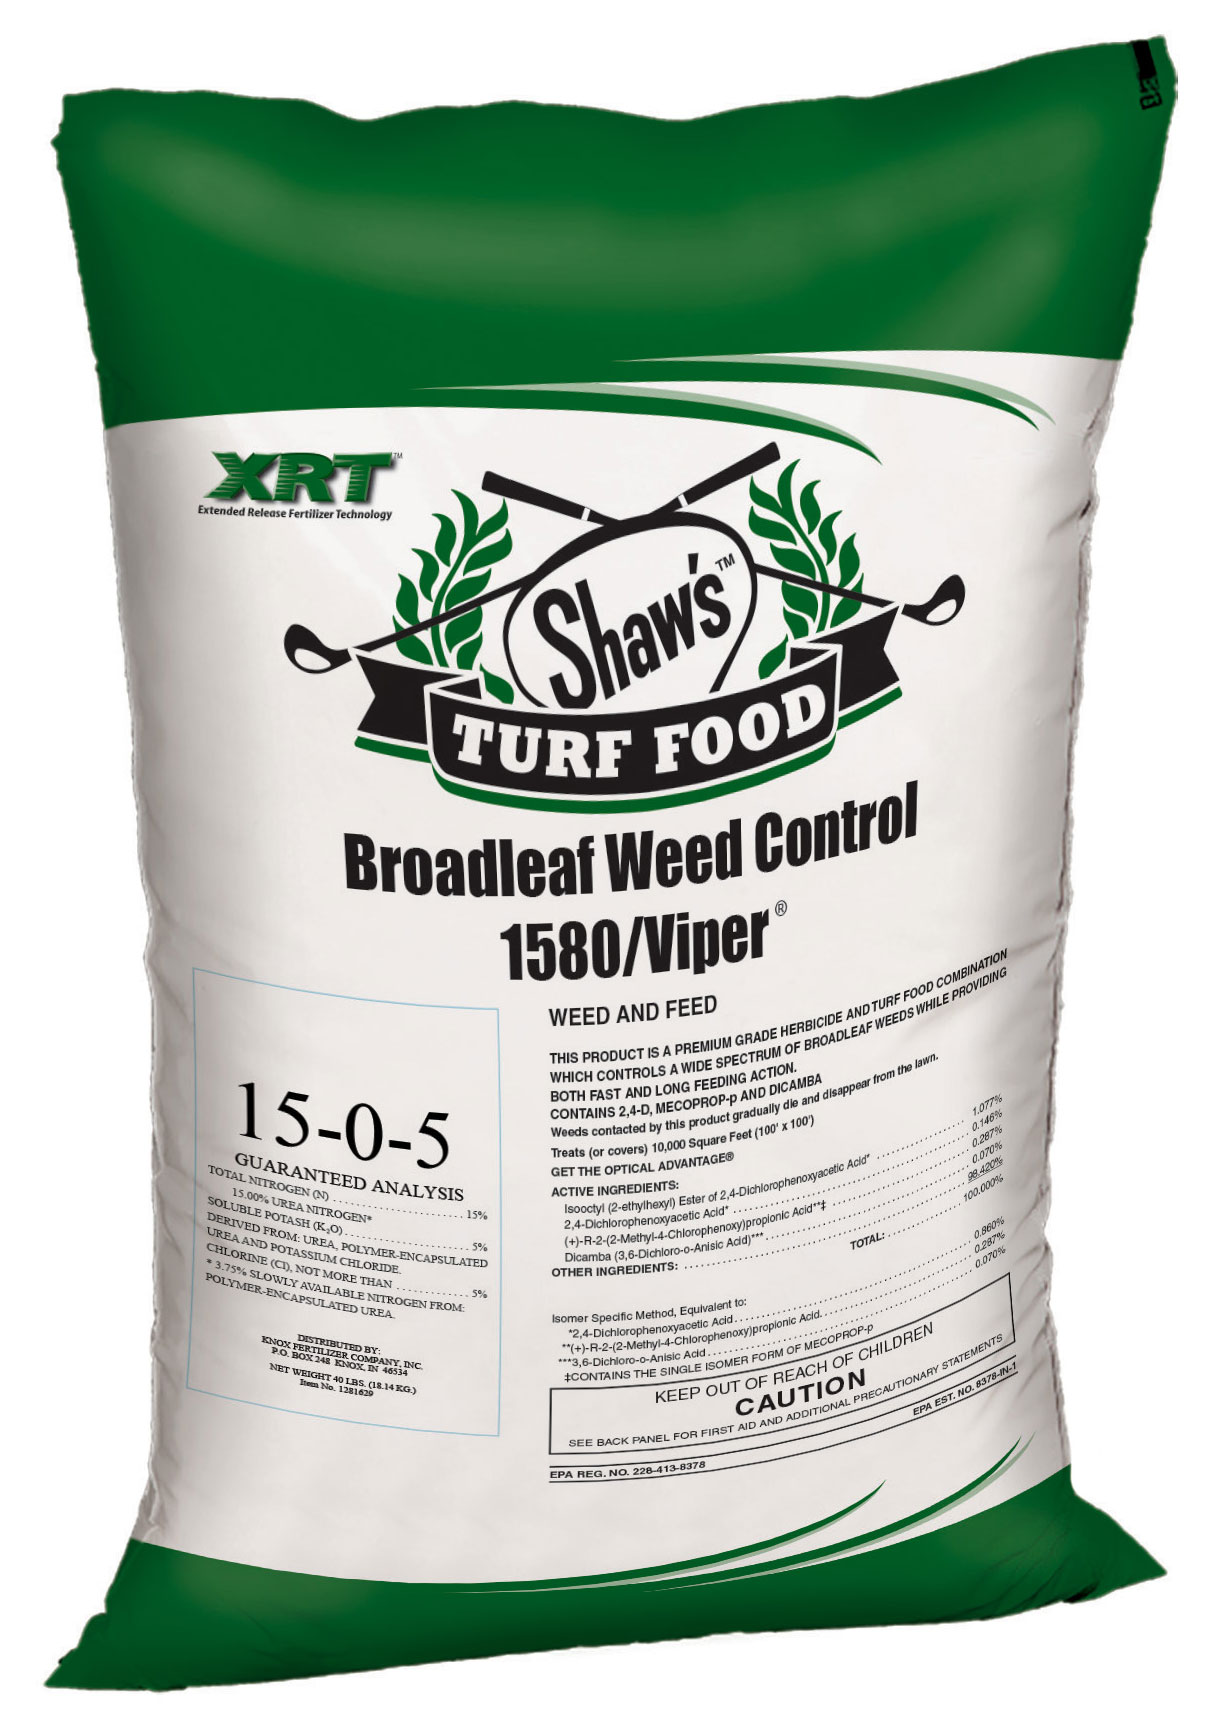 Shaw's Herbicides